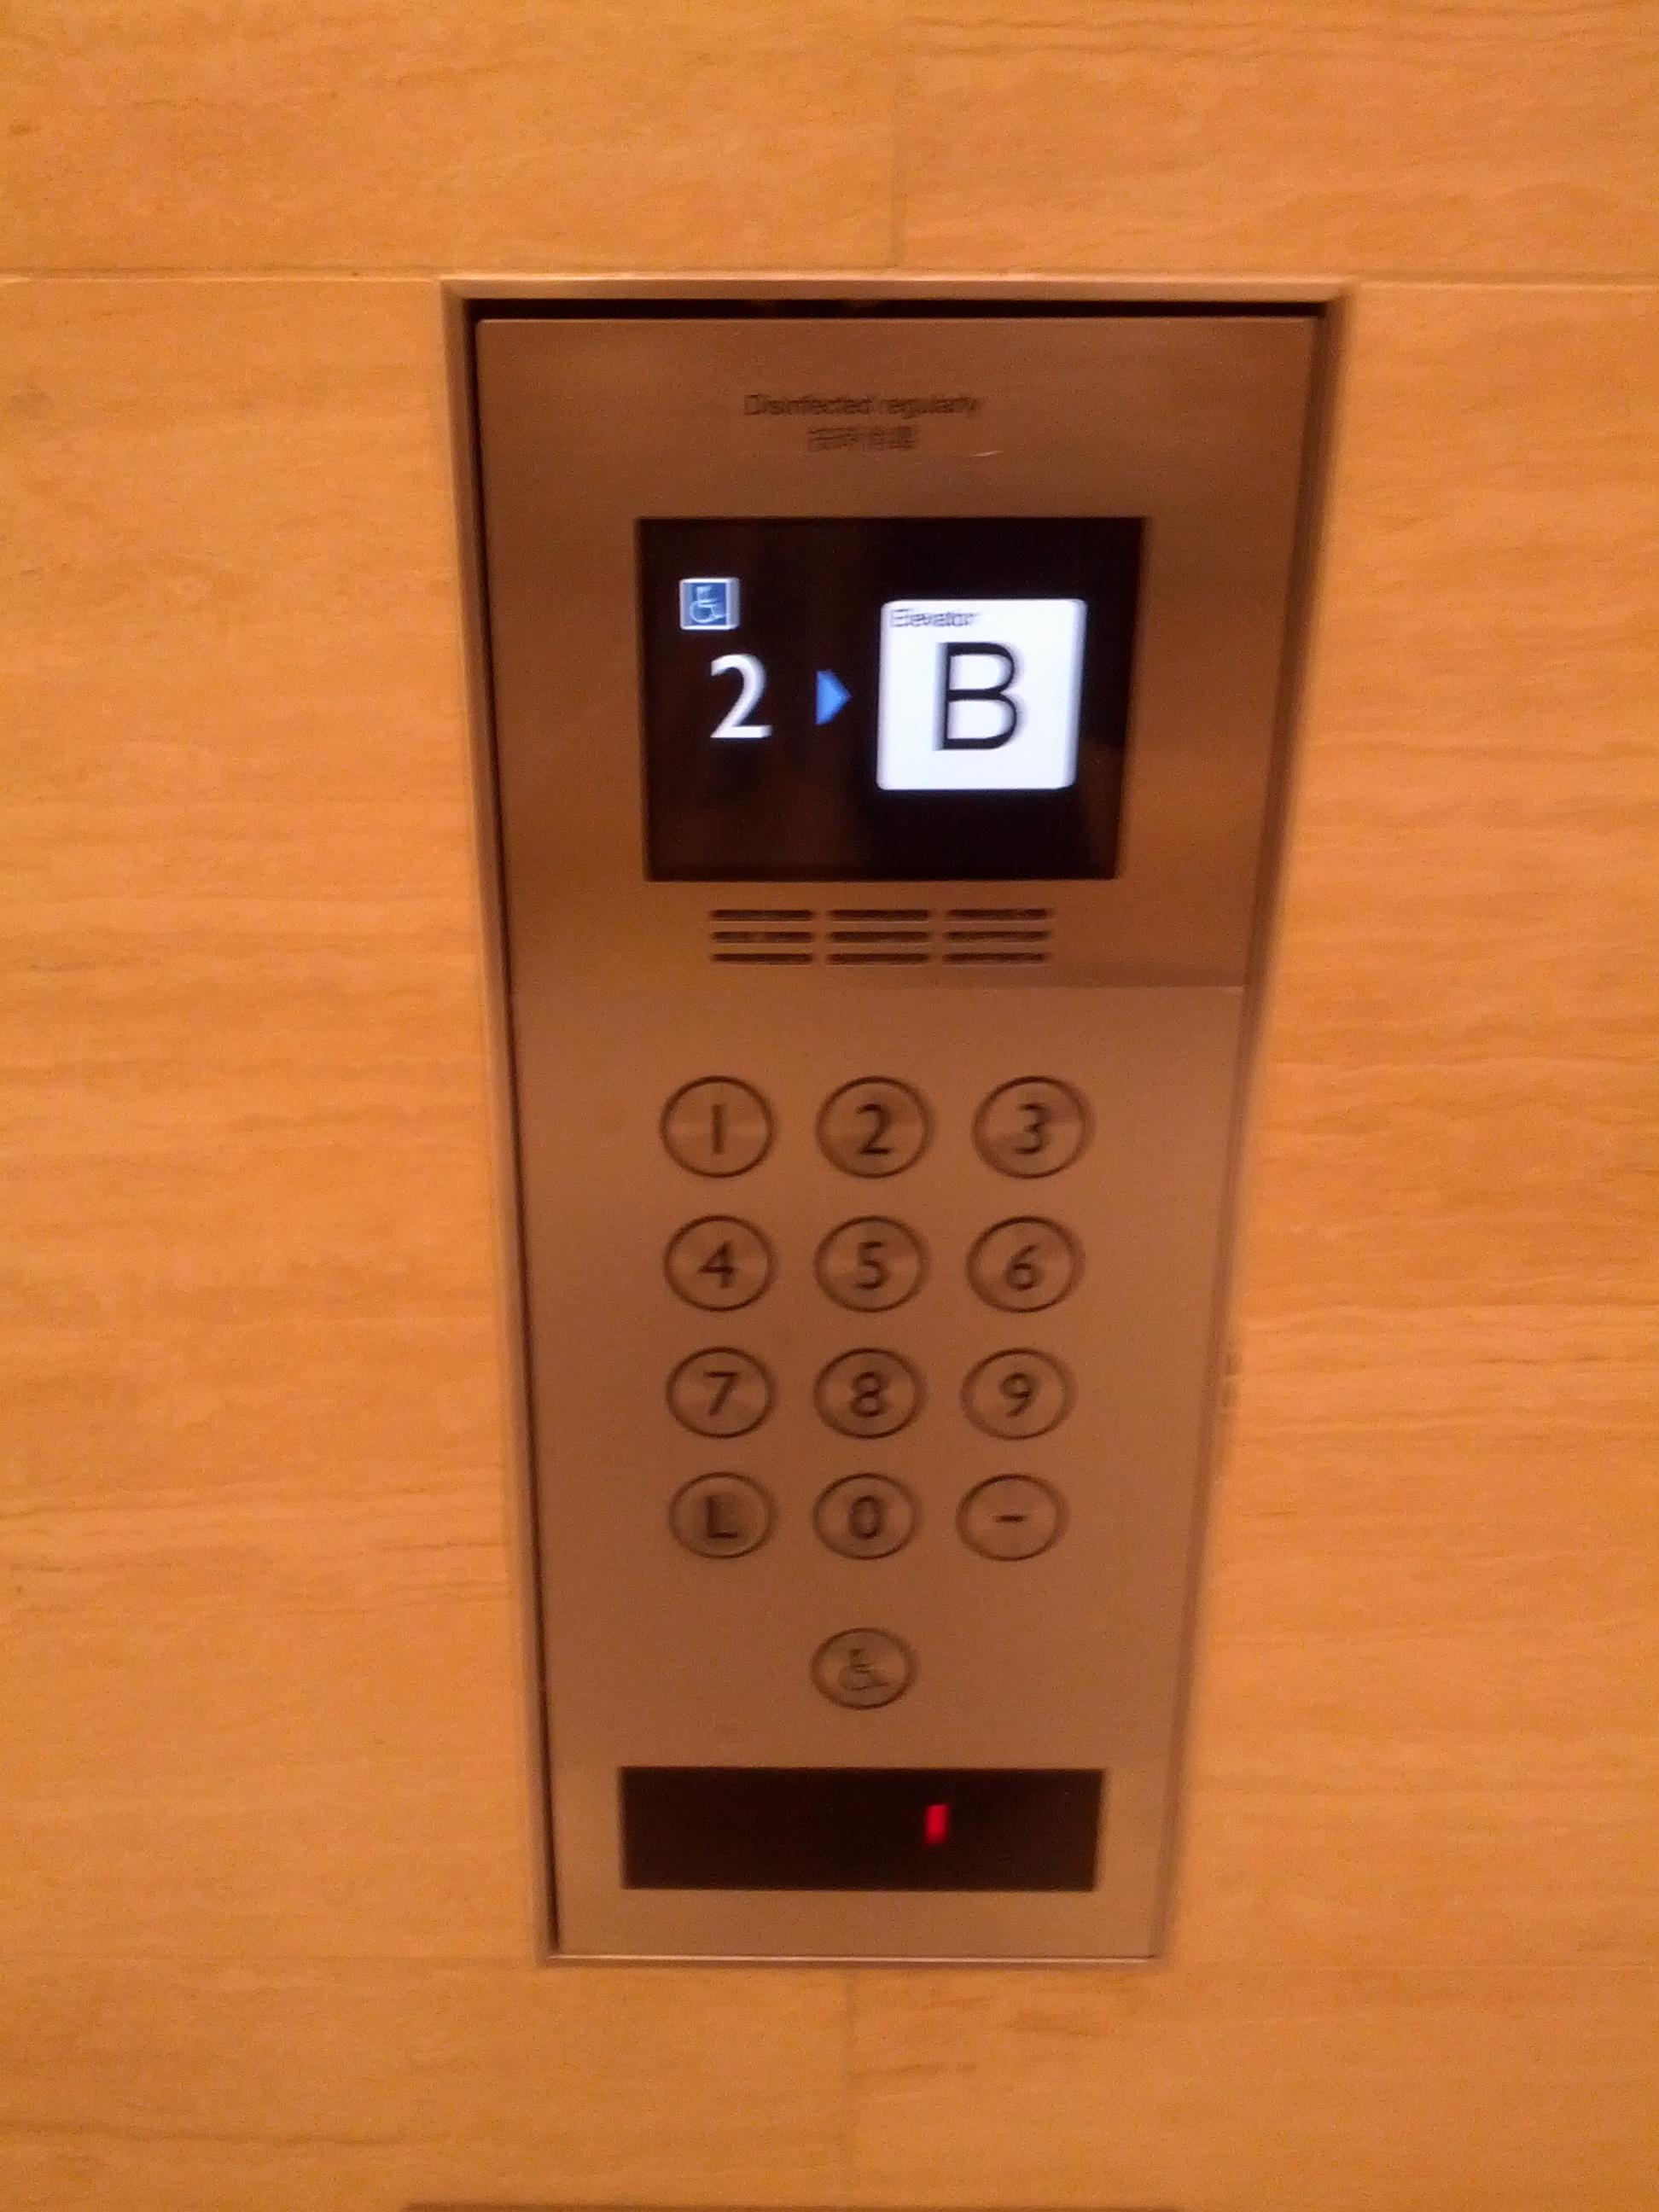 image mitsubishi doas floor input handicap jpg elevator wiki rh elevation wikia com mitsubishi elevator manual pdf shanghai mitsubishi elevator manual